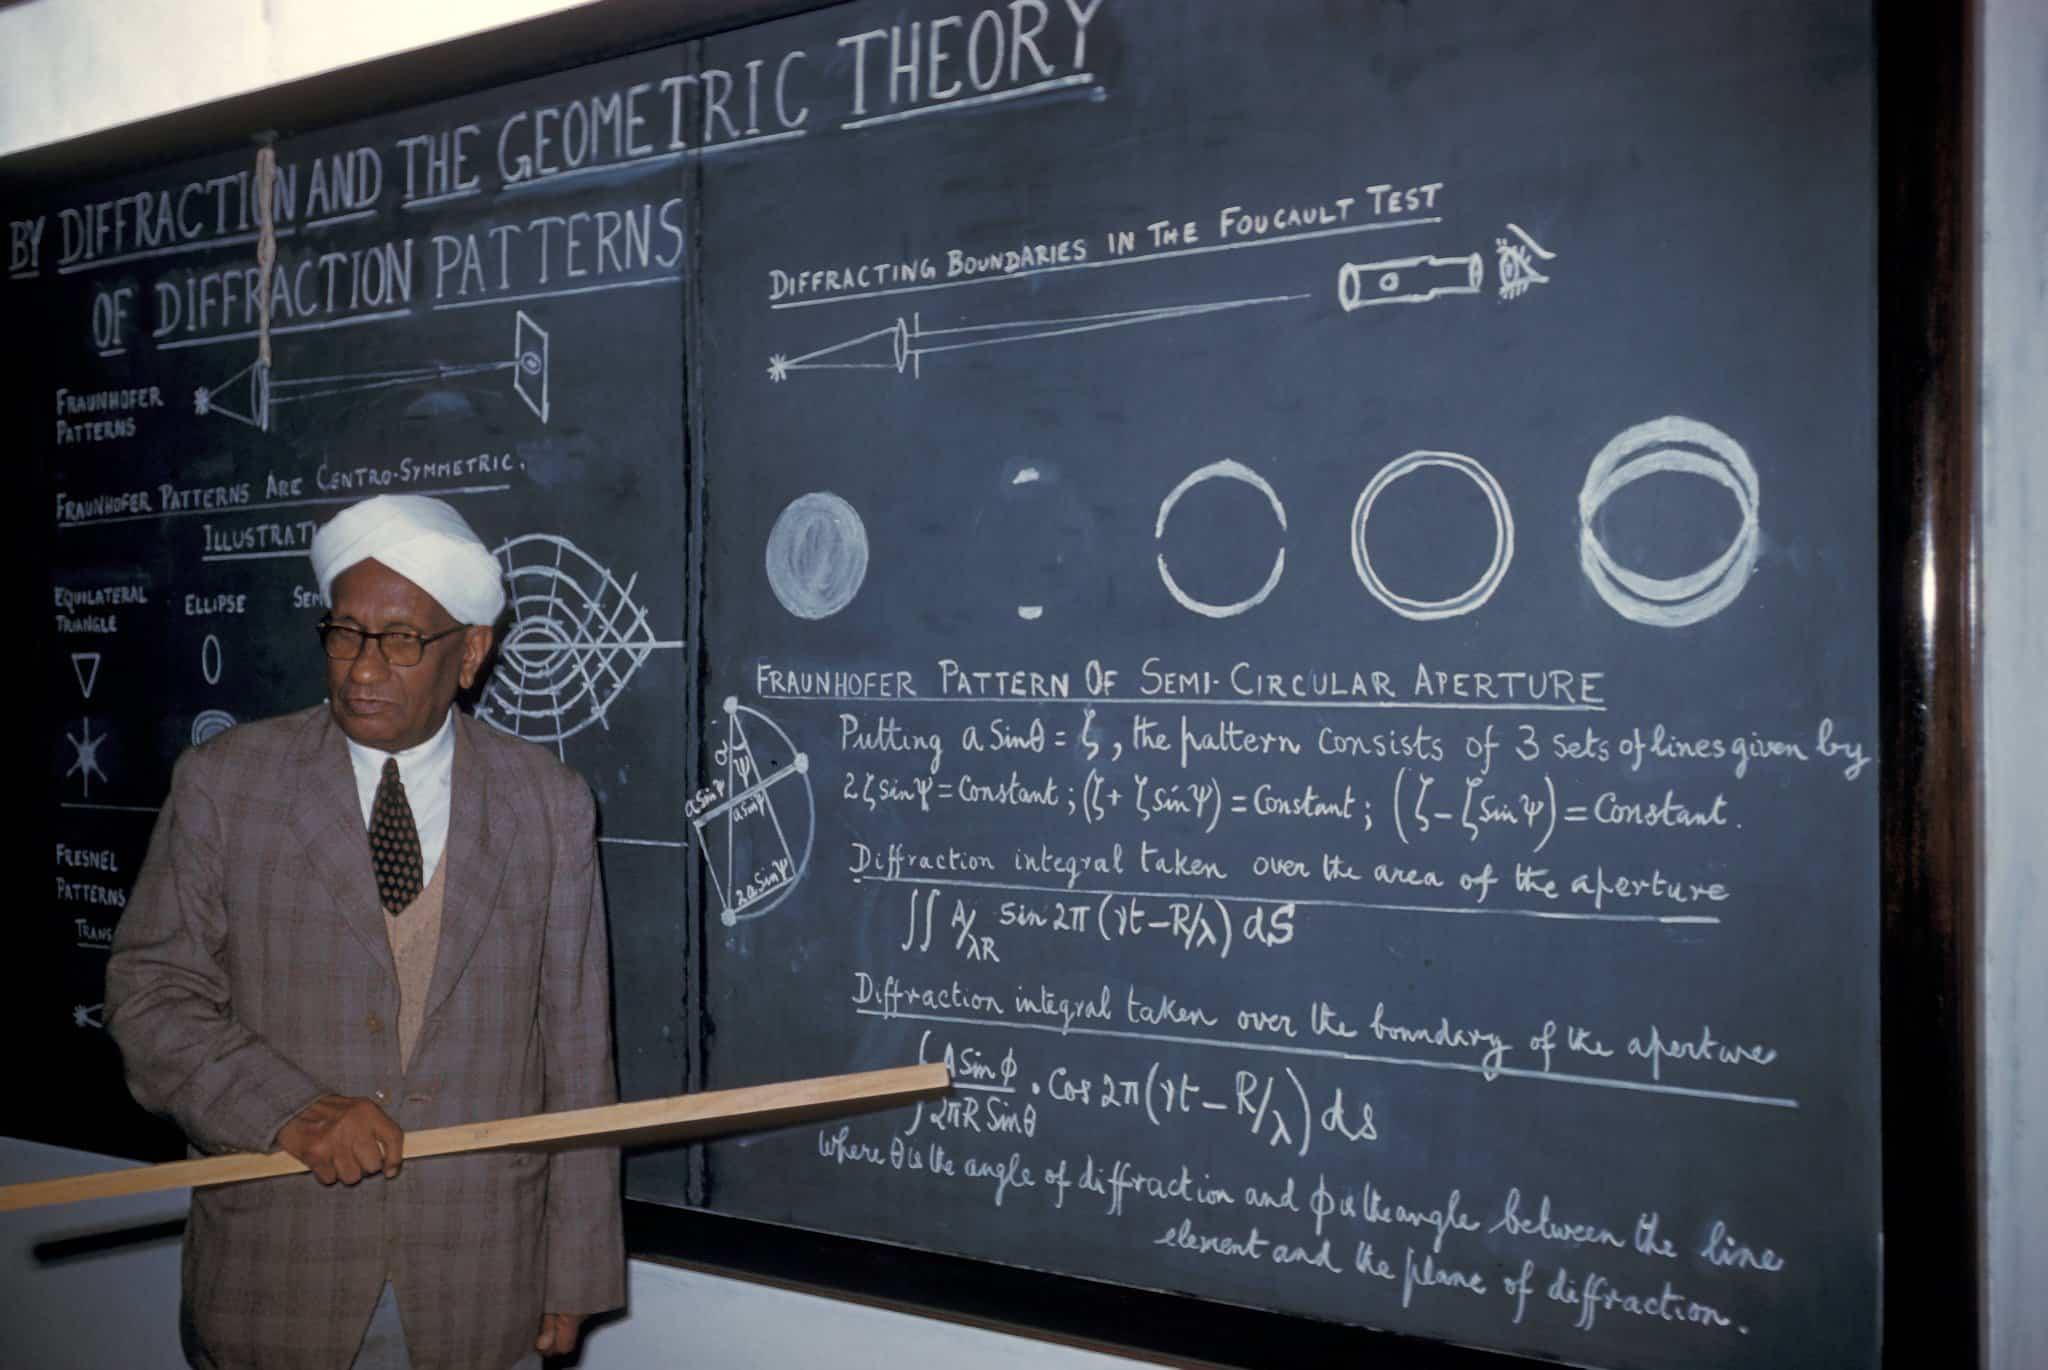 Cv raman teaching a class in 1960 photo